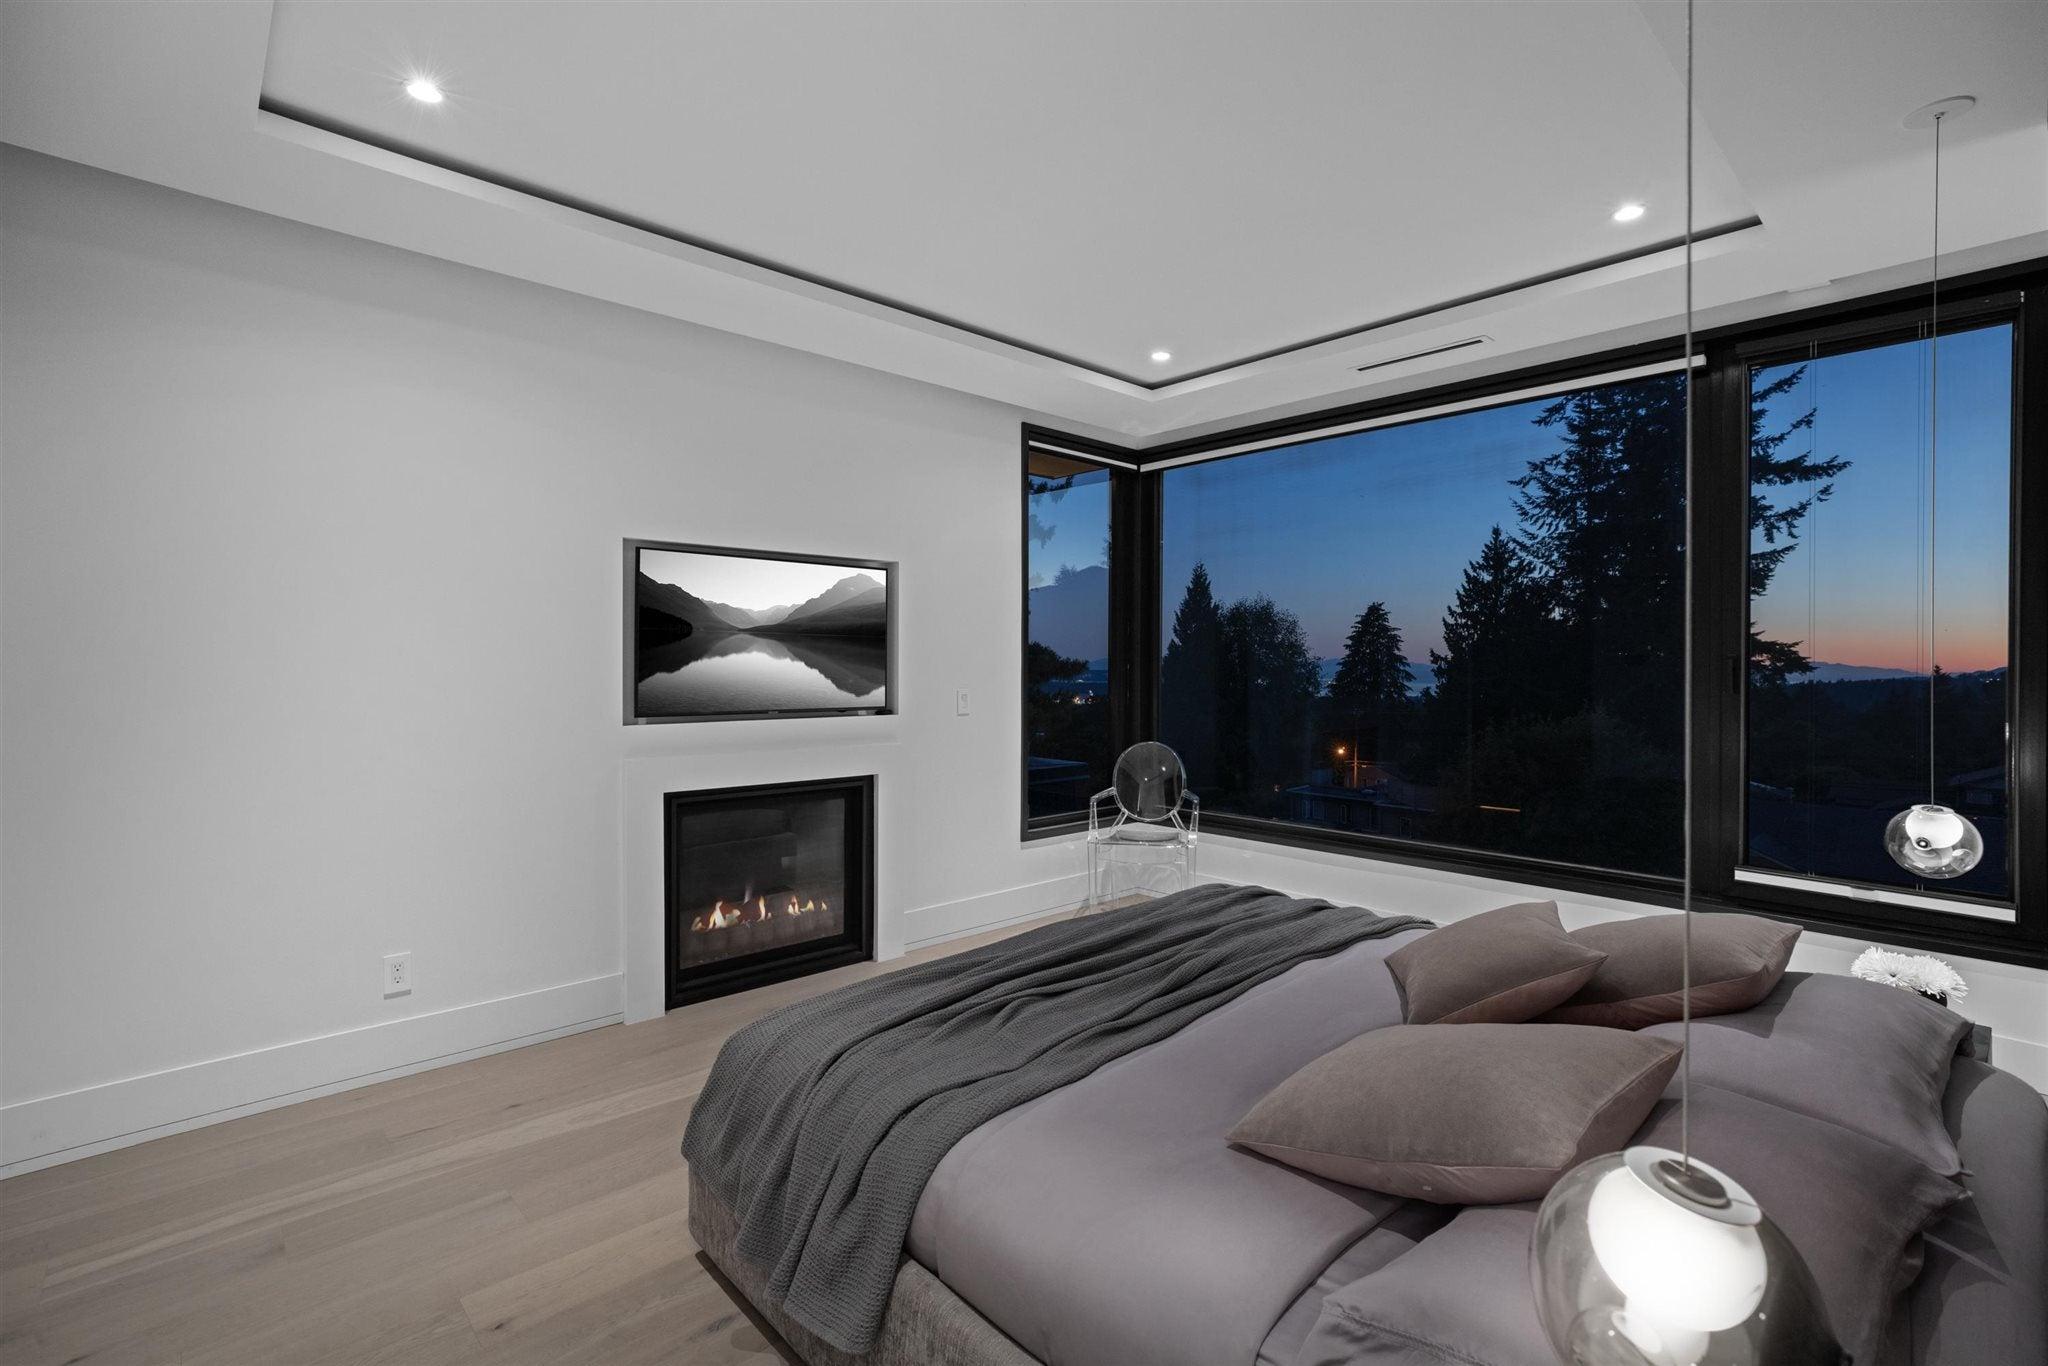 276 SANDRINGHAM CRESCENT - Upper Lonsdale House/Single Family for sale, 7 Bedrooms (R2617703) - #23